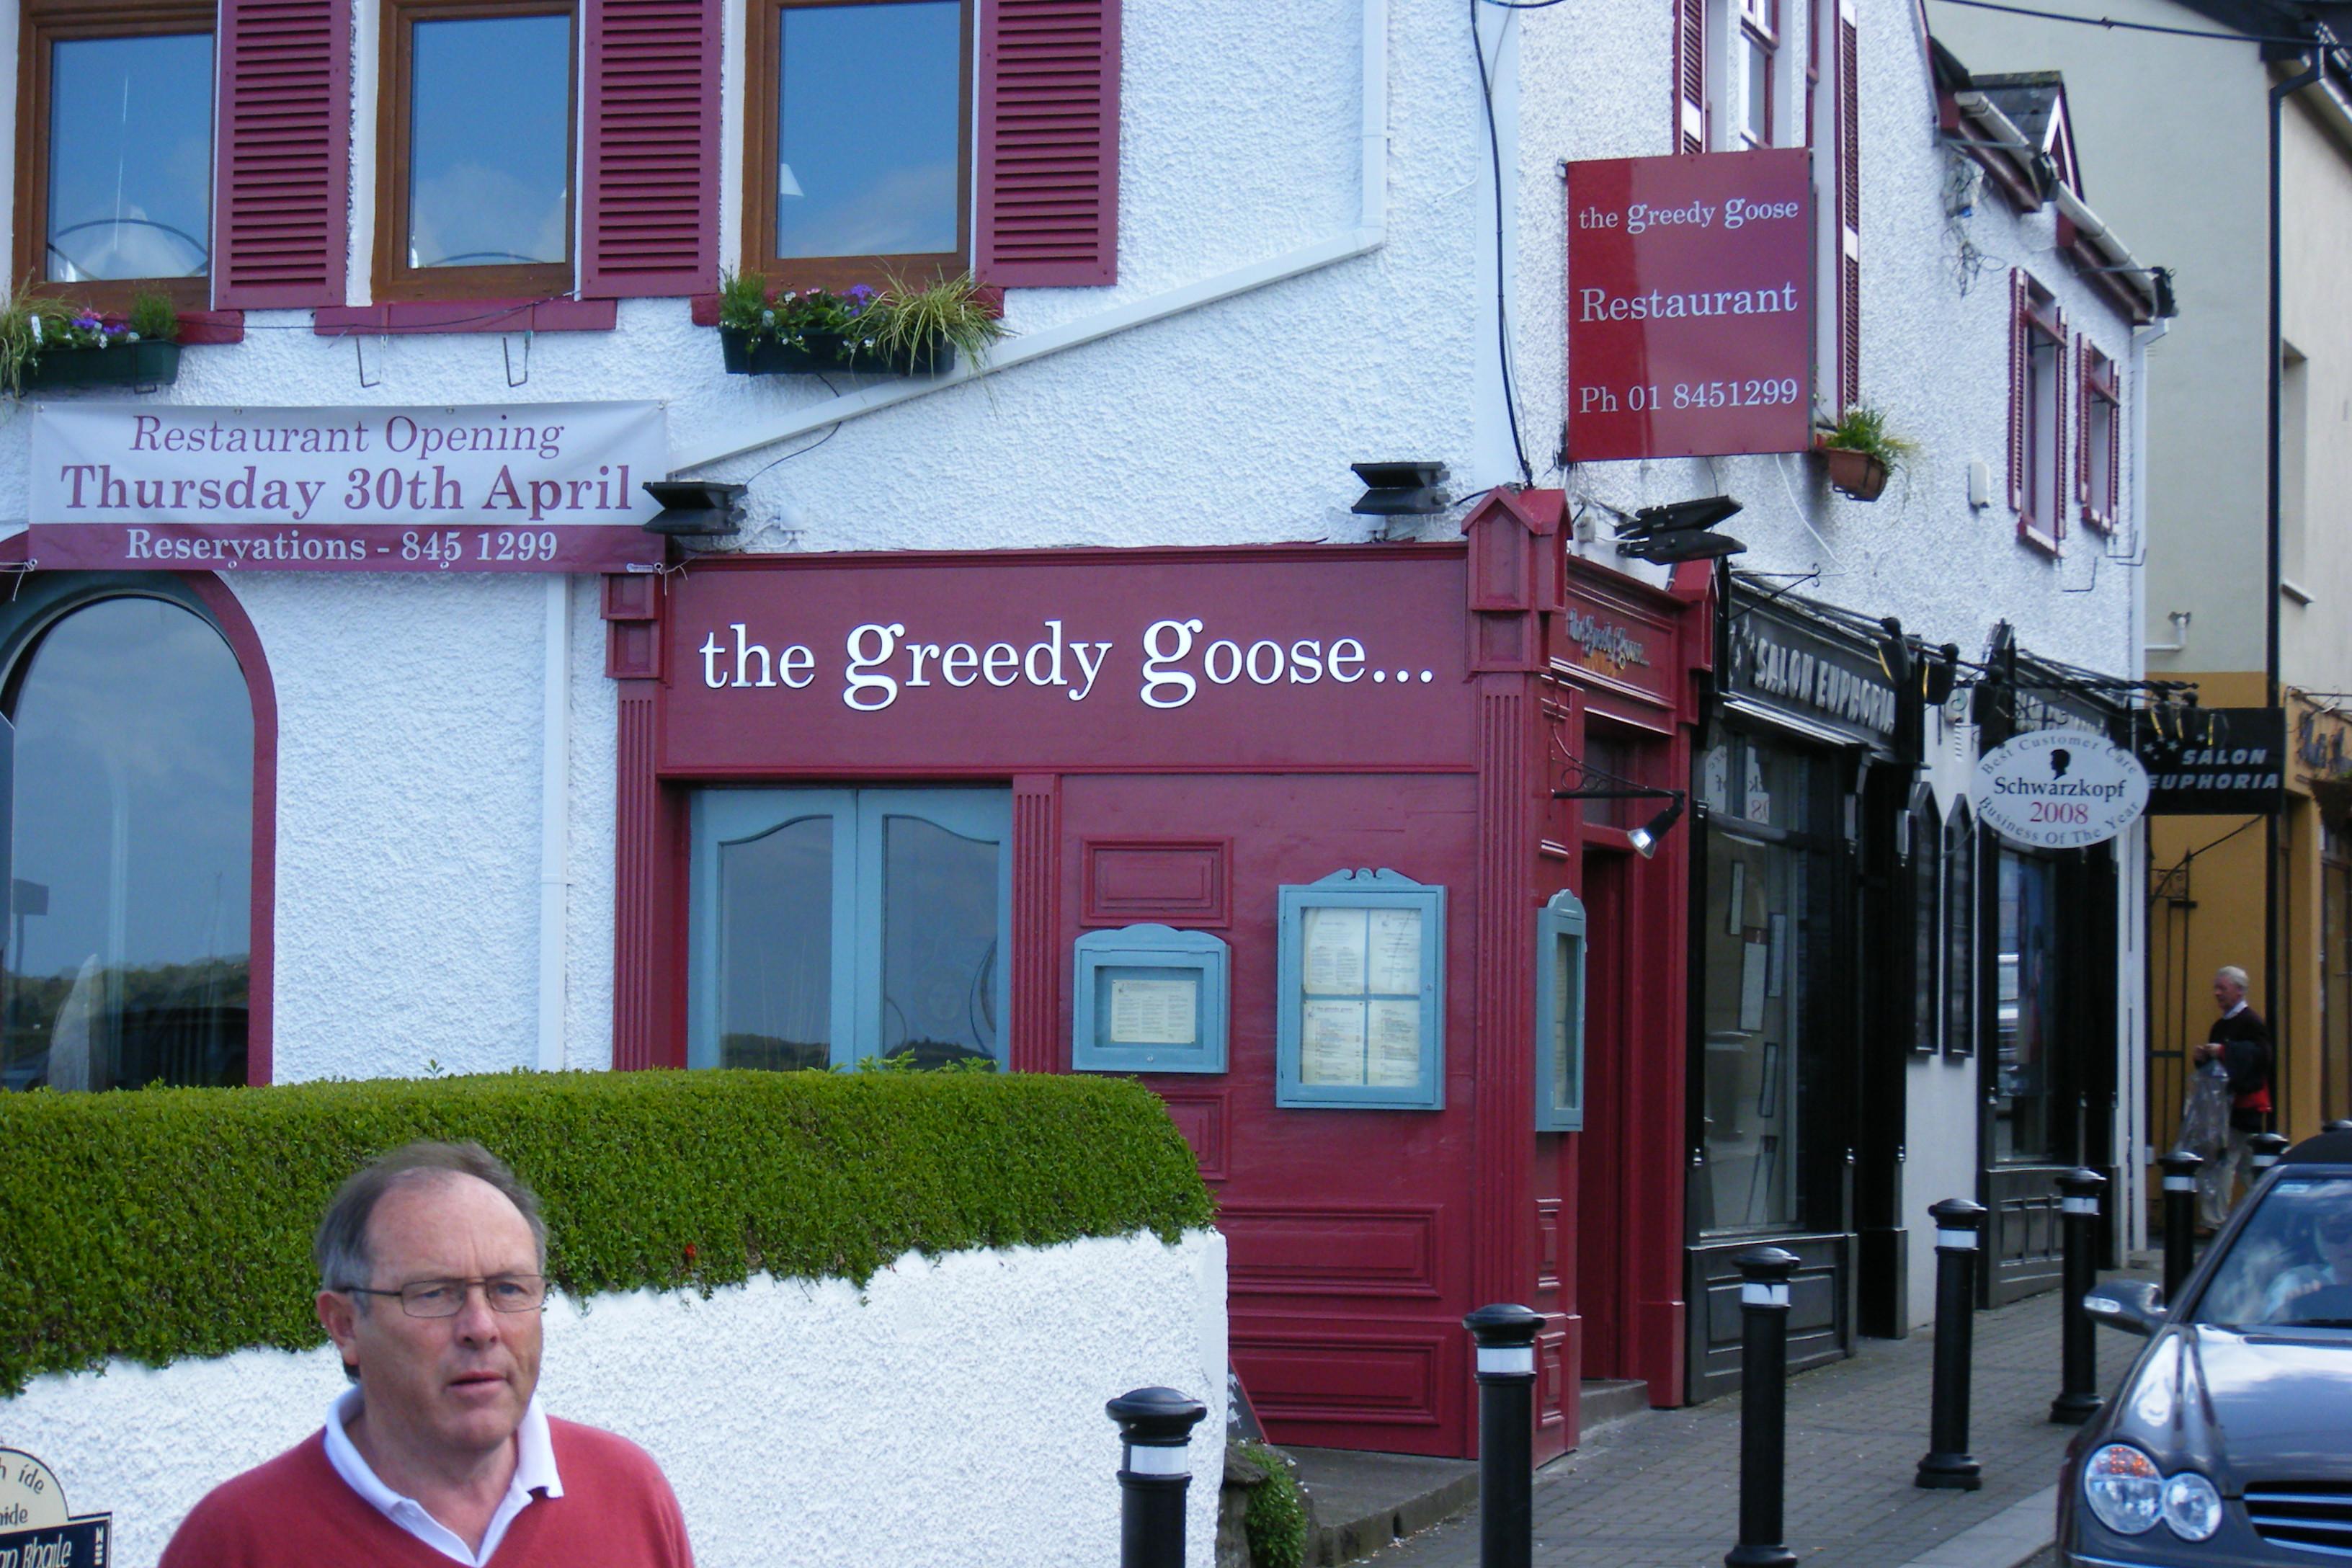 The Greedy Goose Shop front Foam PVC